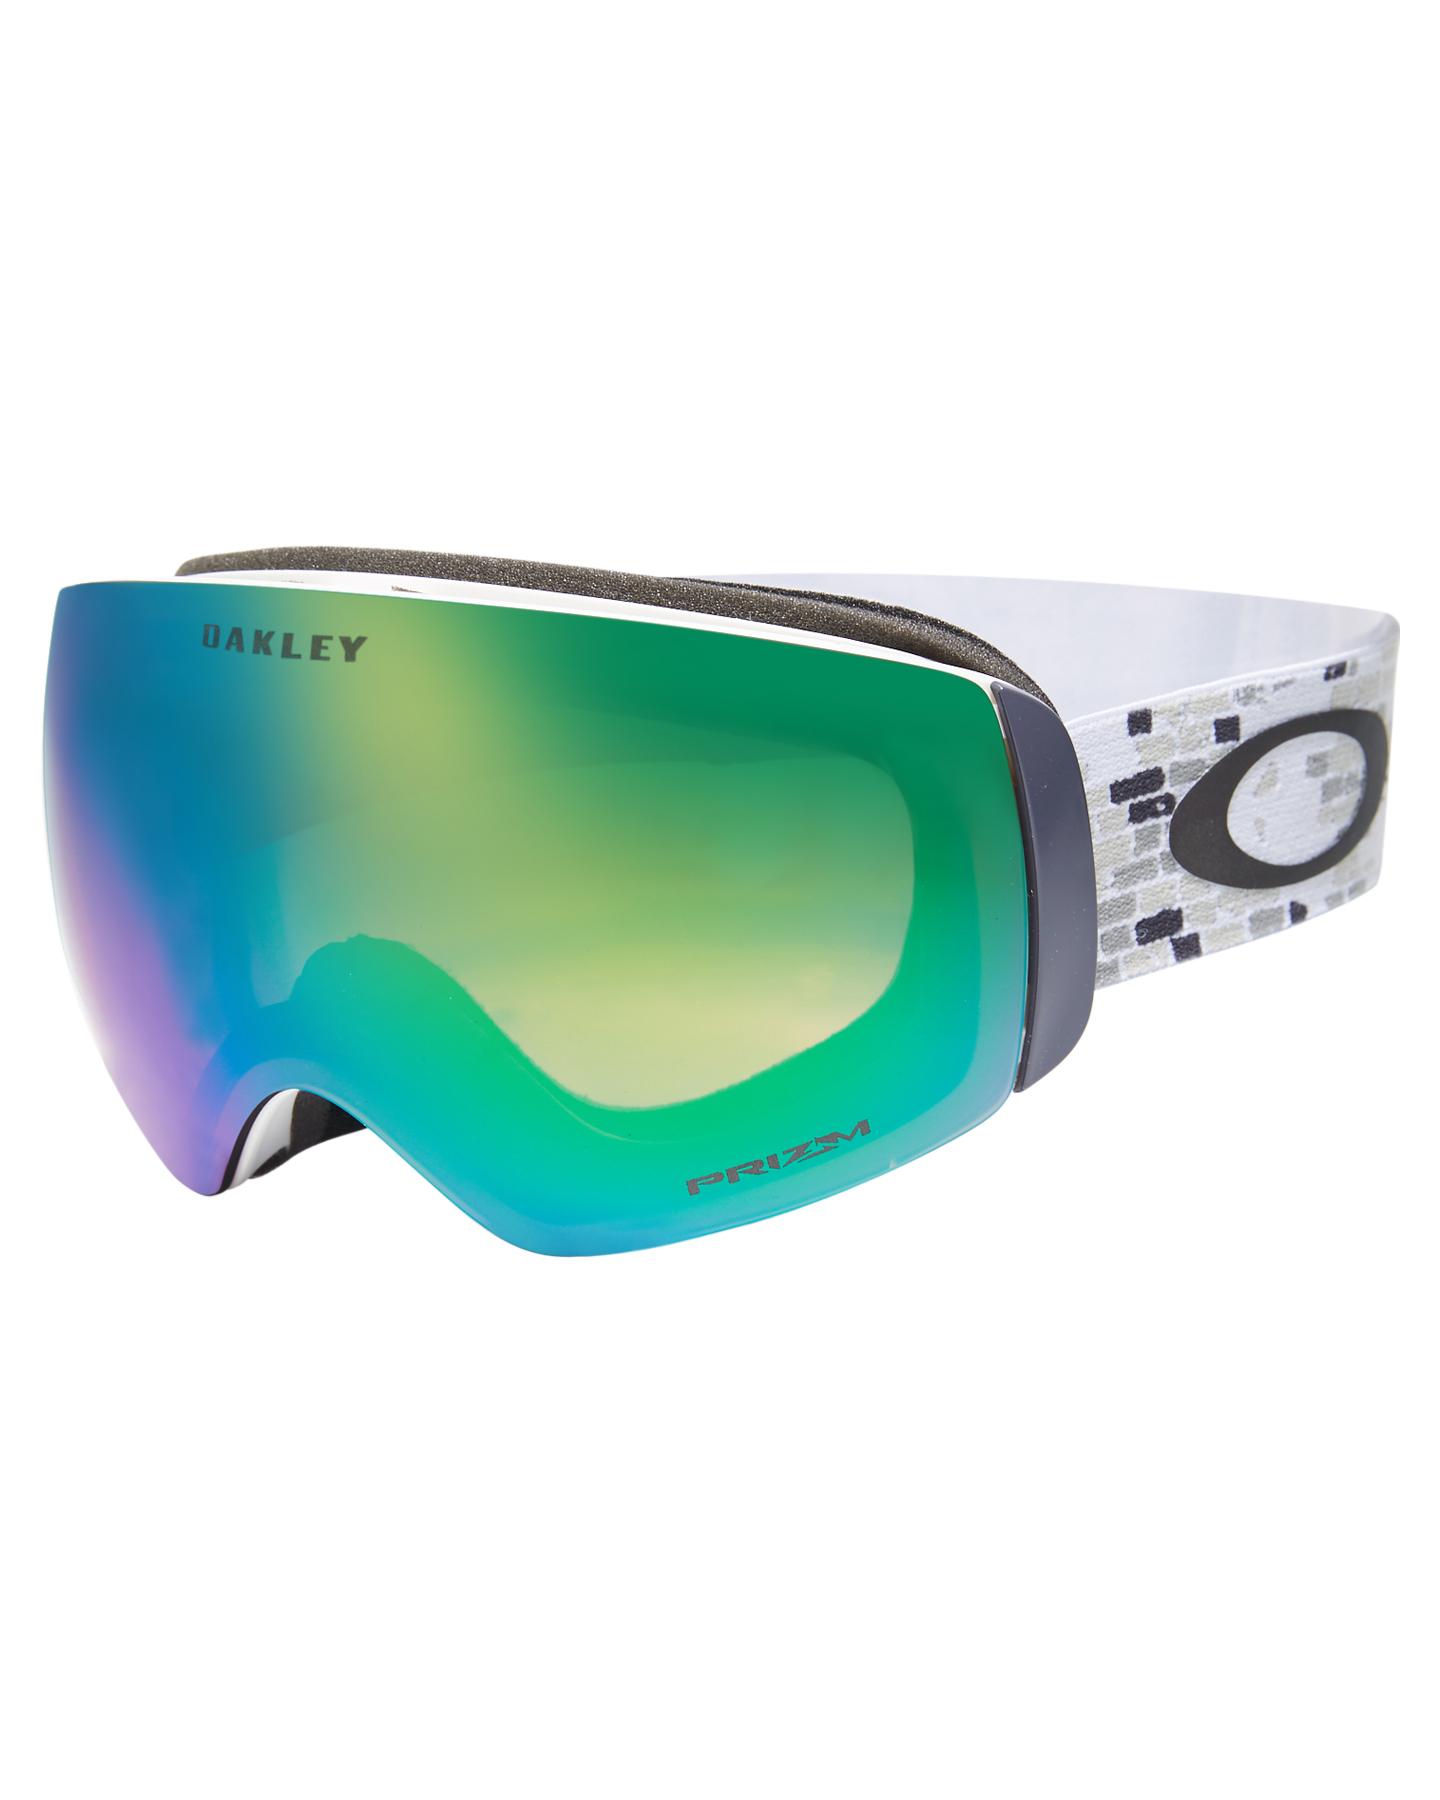 63956fc4d78 Oakley Flight Deck Xm Lindsey Vonn Snow Goggle - Snowed Stealth ...